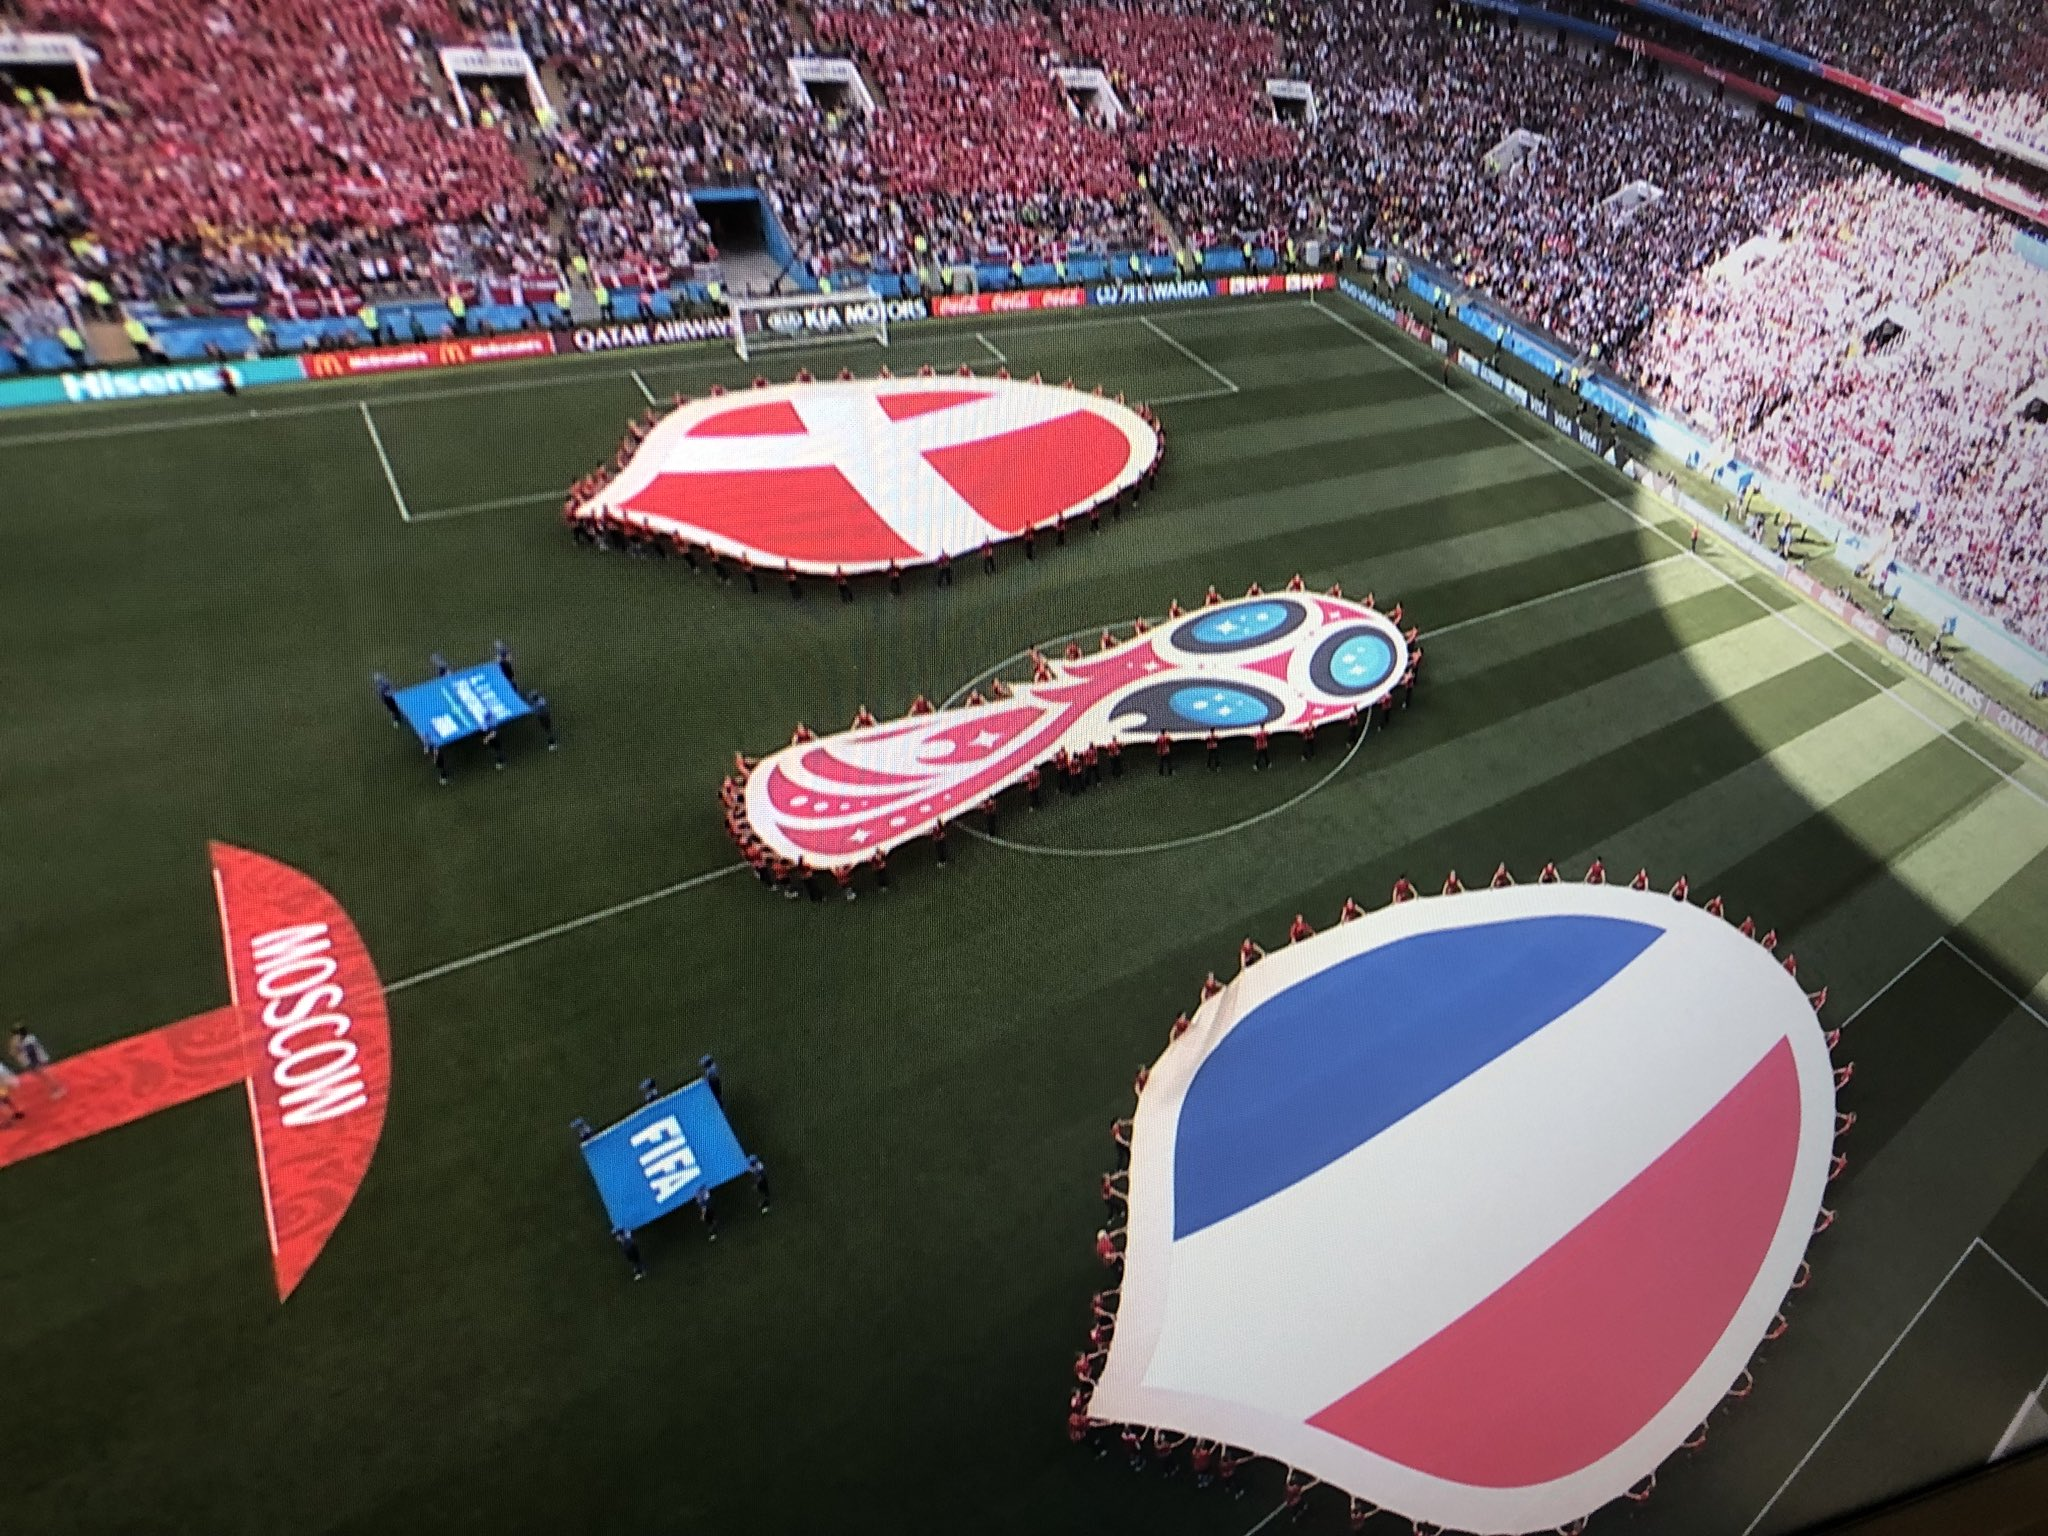 Dinamarca igualo 0-0 ante Francia